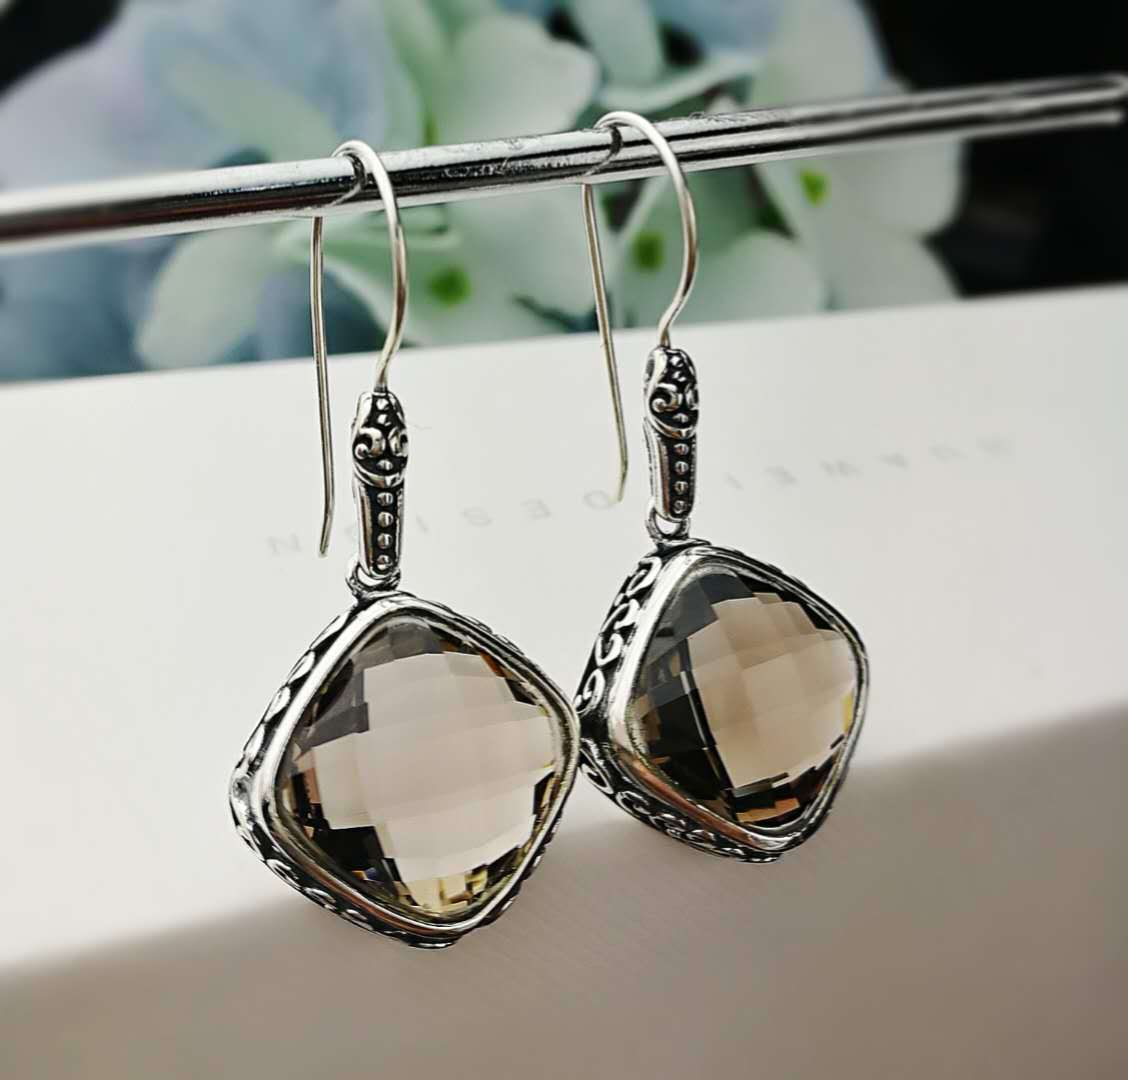 S925 silver inlaid Earrings lady's Retro cut Tea Face Earrings Fashion Style Jewelry Earrings accessories wholesale